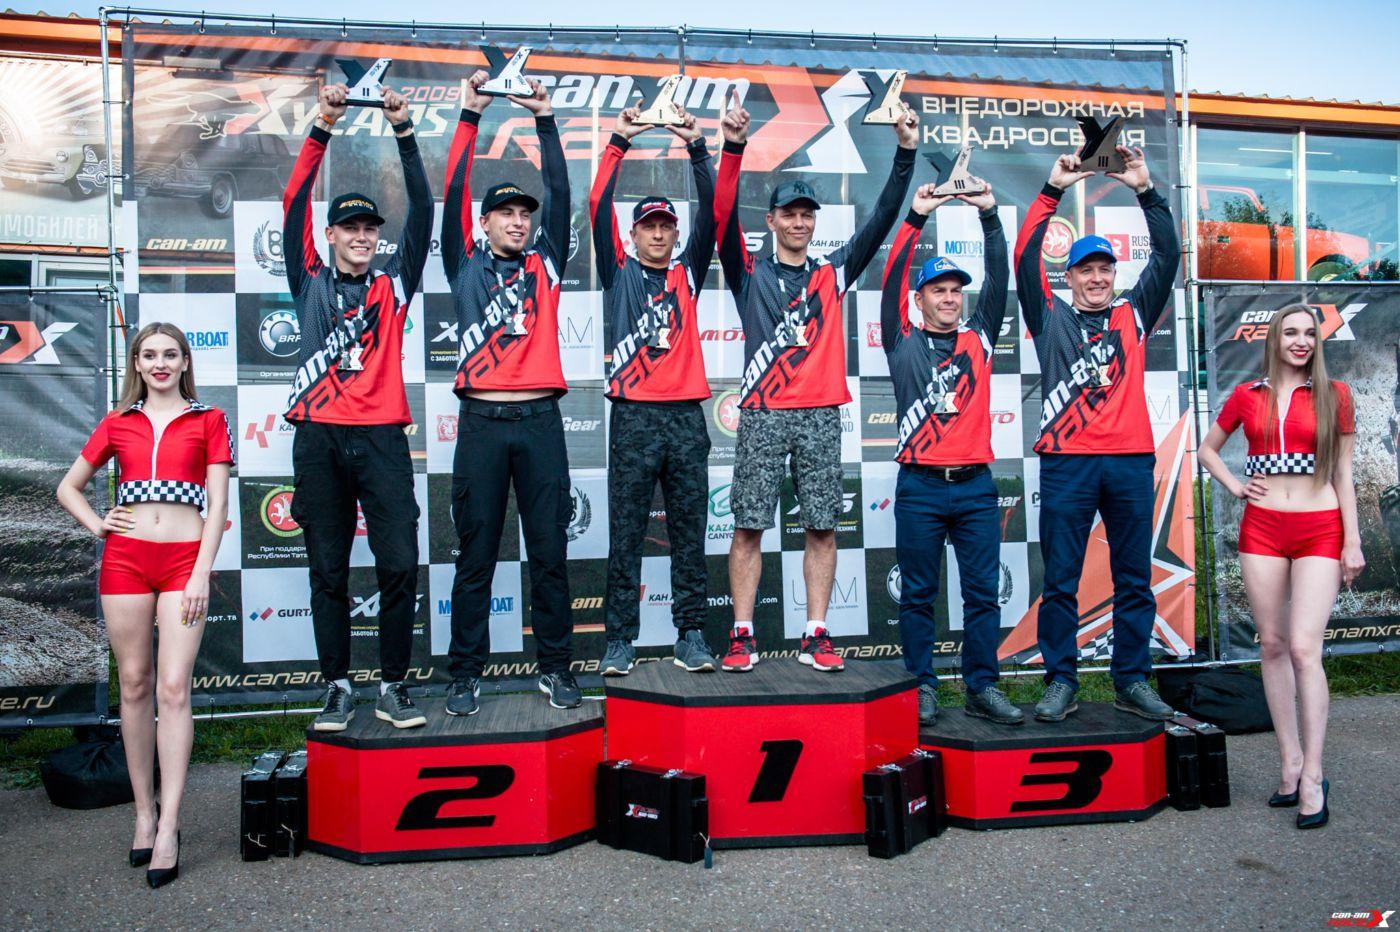 FORMULA7 TEAM занимает призовые места на 1 этапе Can-Am X Race